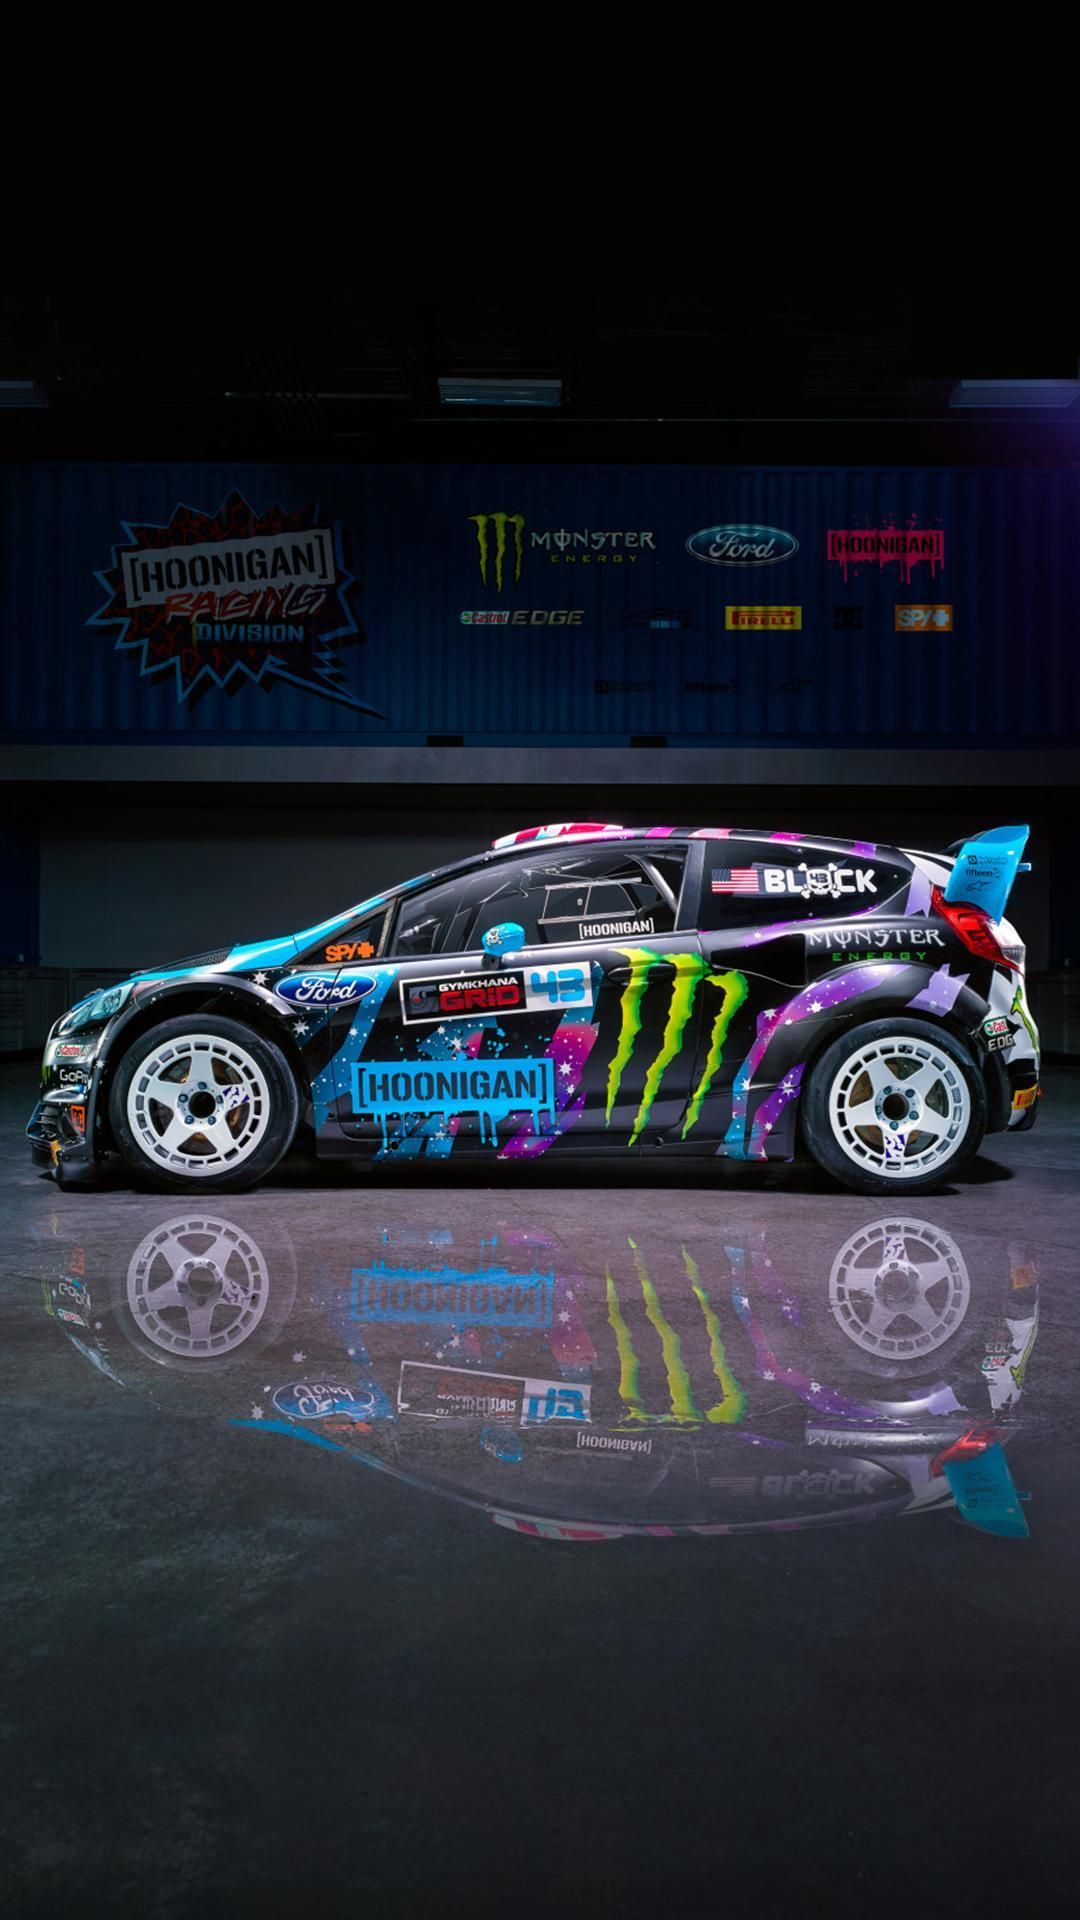 Racing Car Aestethics Gt Cars Jdm Cars Car Iphone Wallpaper